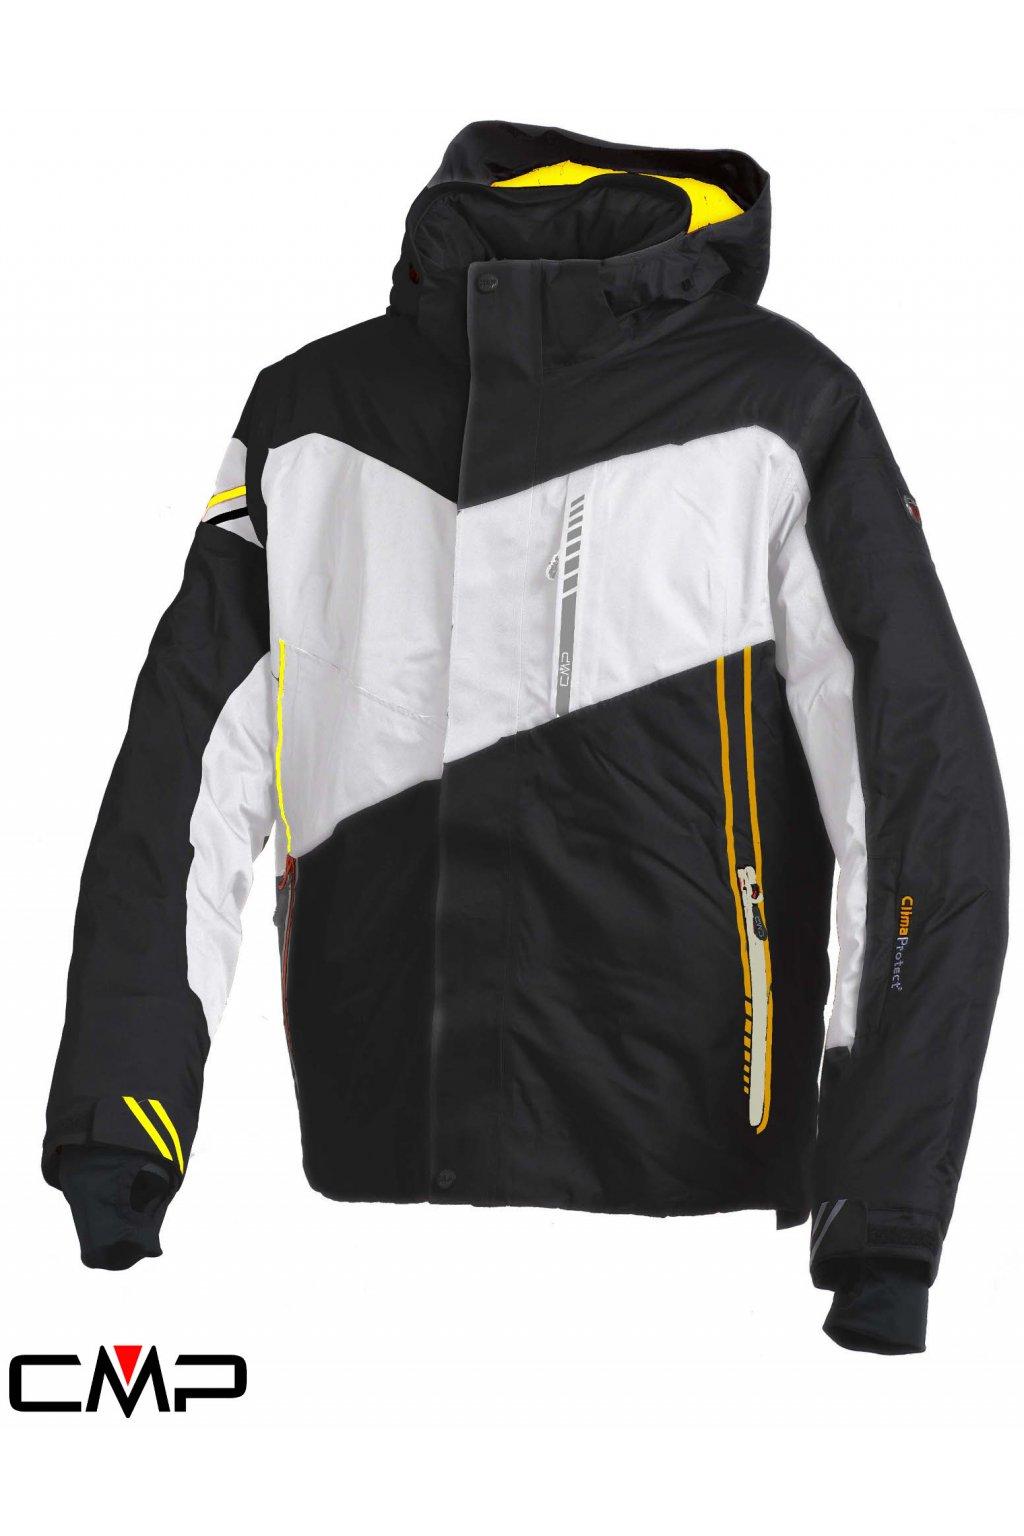 3W23237 387E cmp man ski jacket zip hood